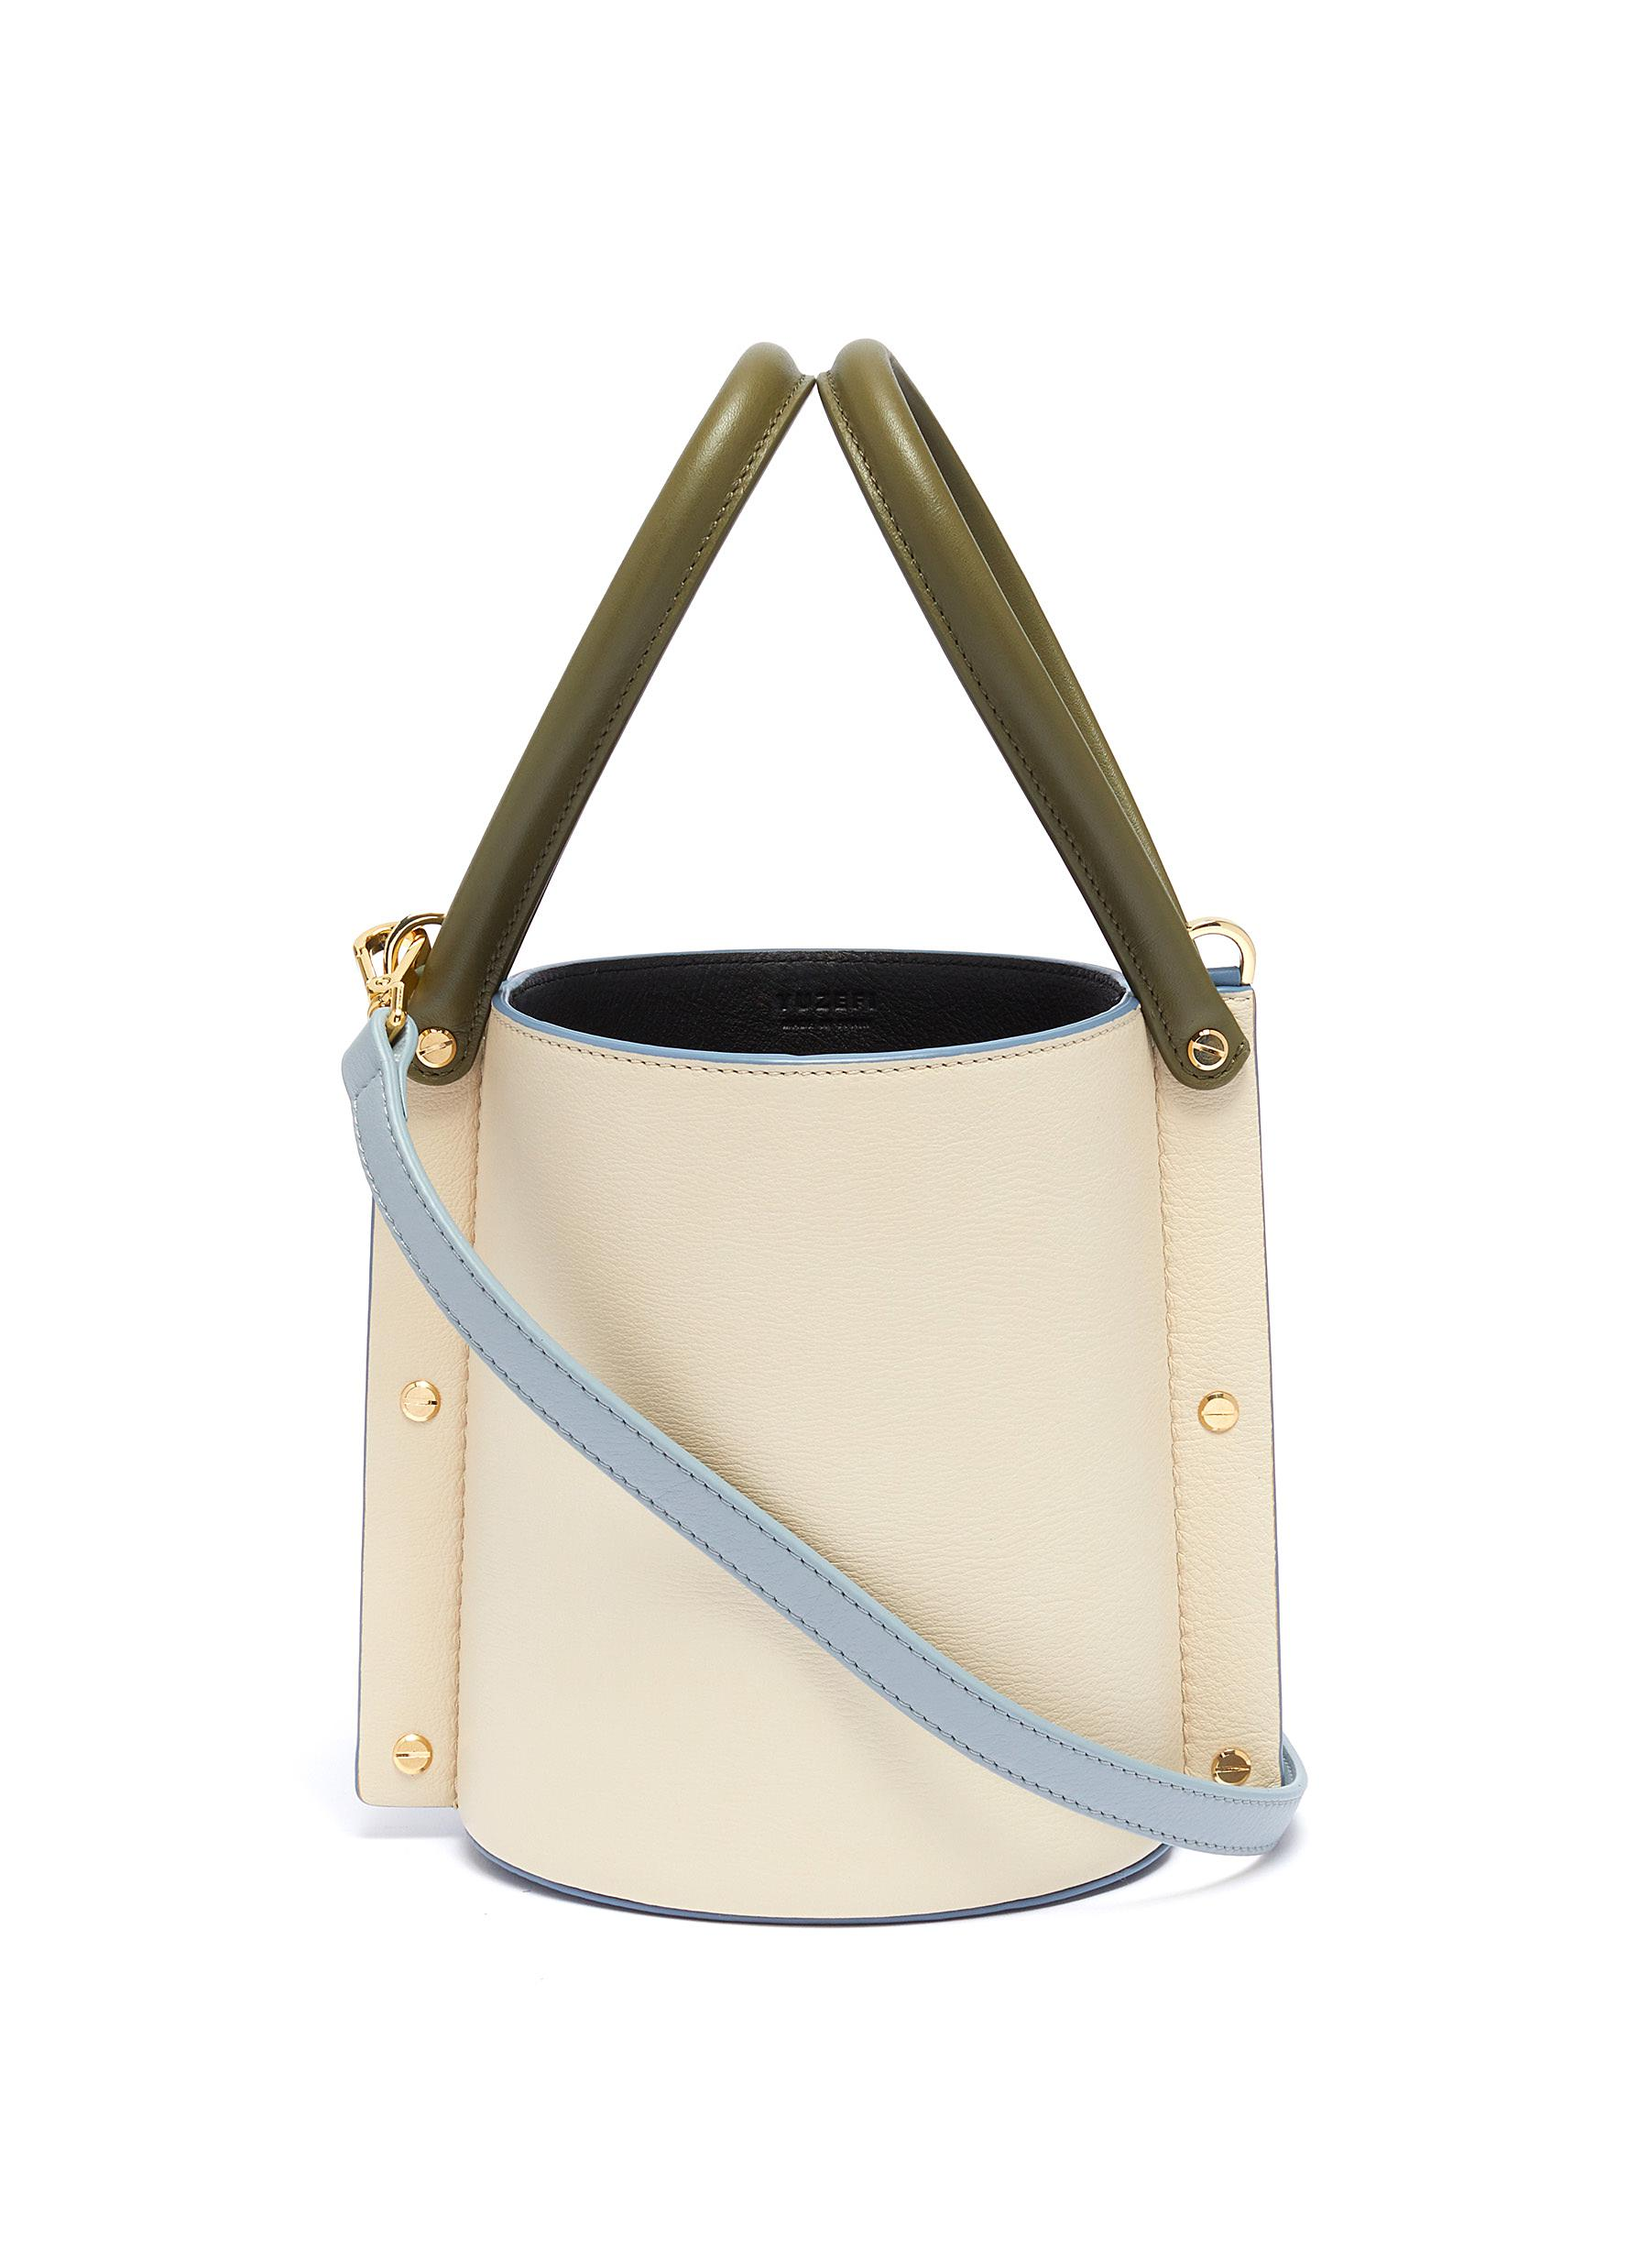 2d9da6f1aeb Main View - Click To Enlarge - Yuzefi - 'Cubo' colourblock leather bucket  bag